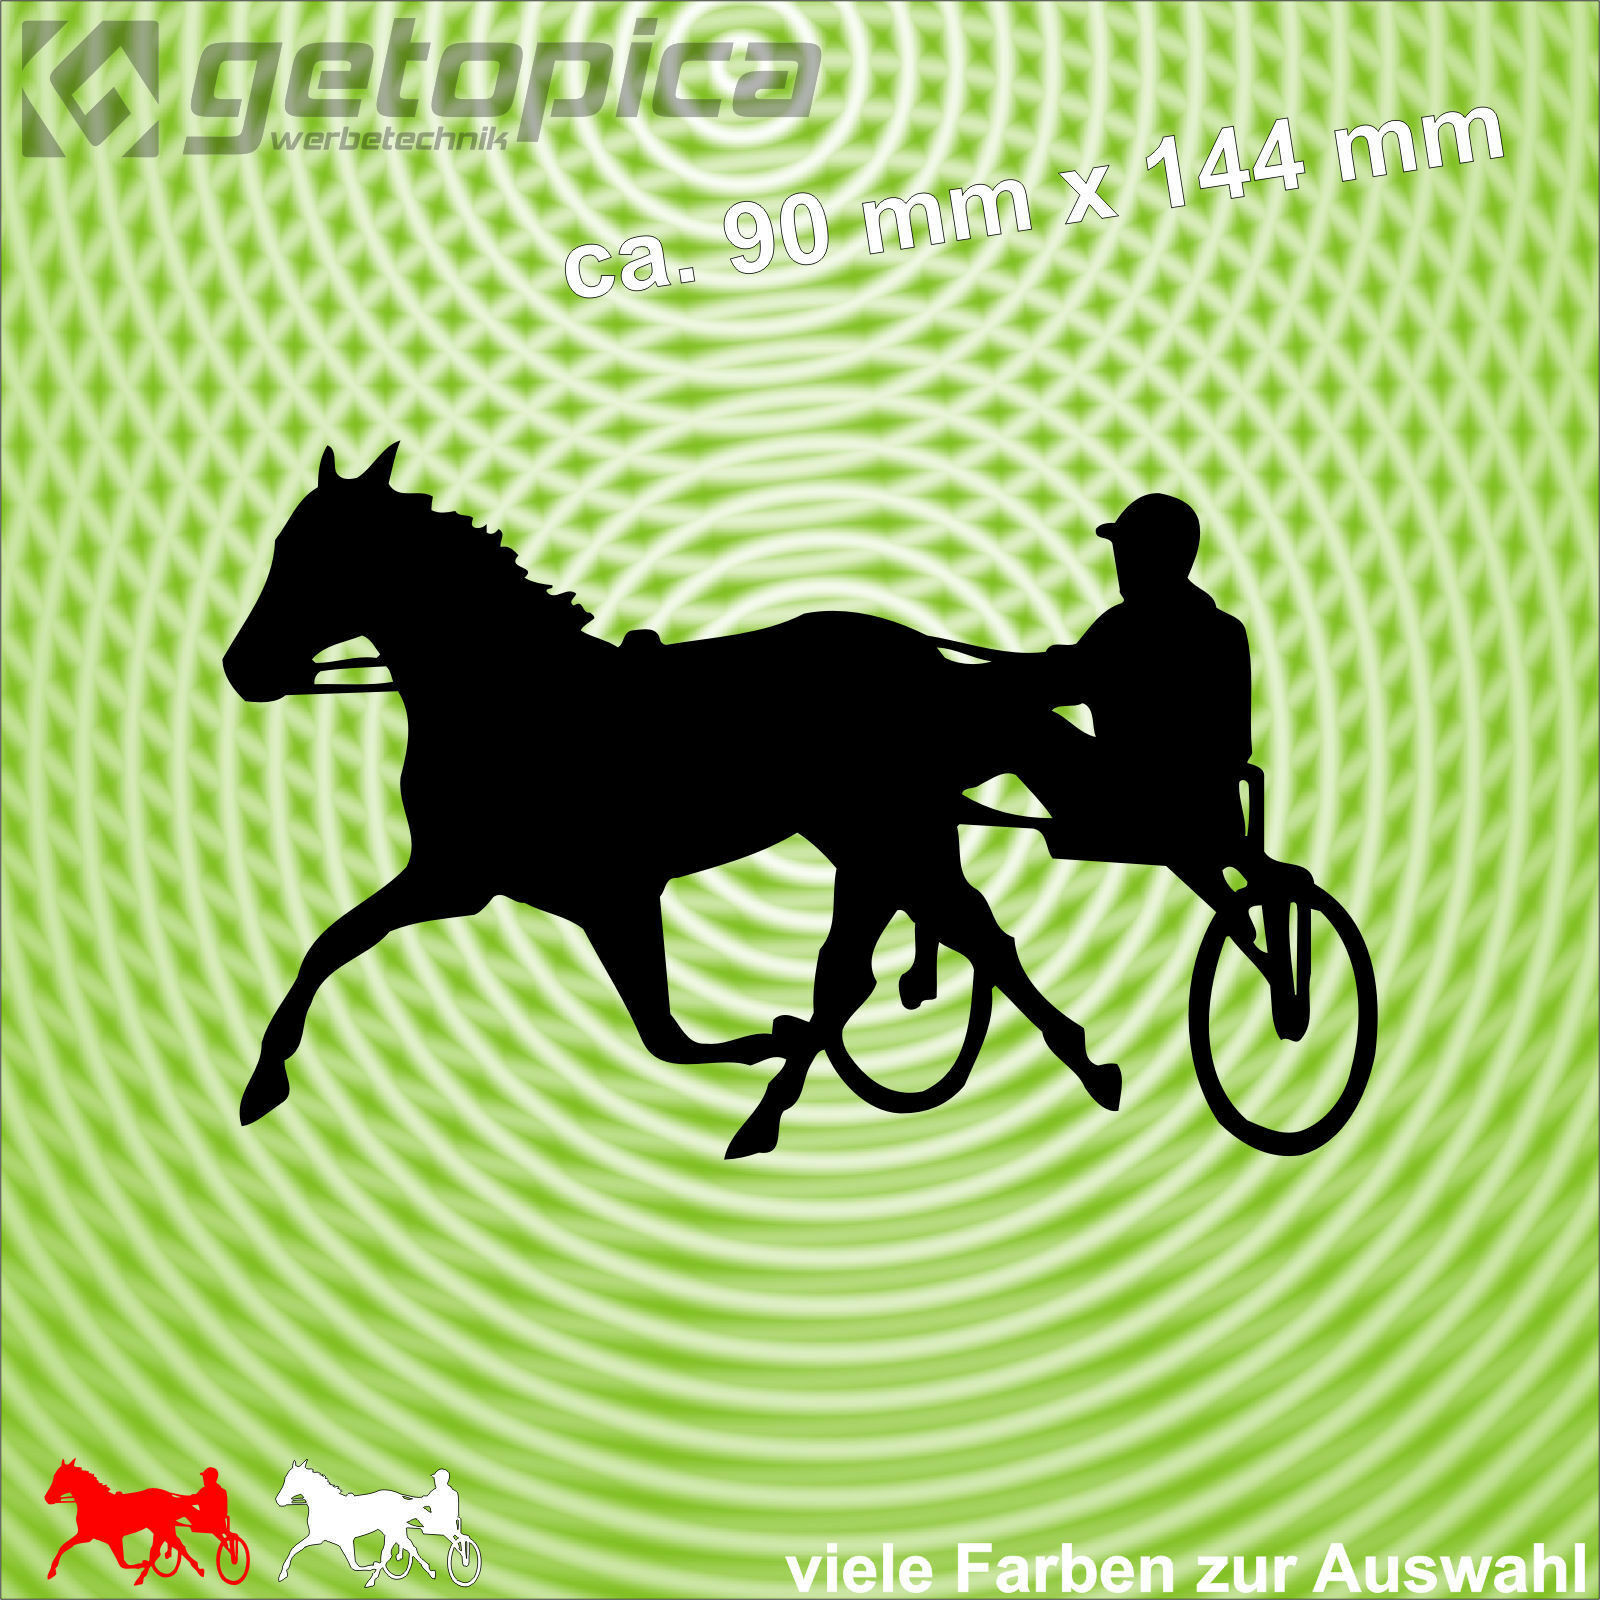 Traber Aufkleber Pferd Trabrennen Sulki Sport Autoaufkleber 14 cm